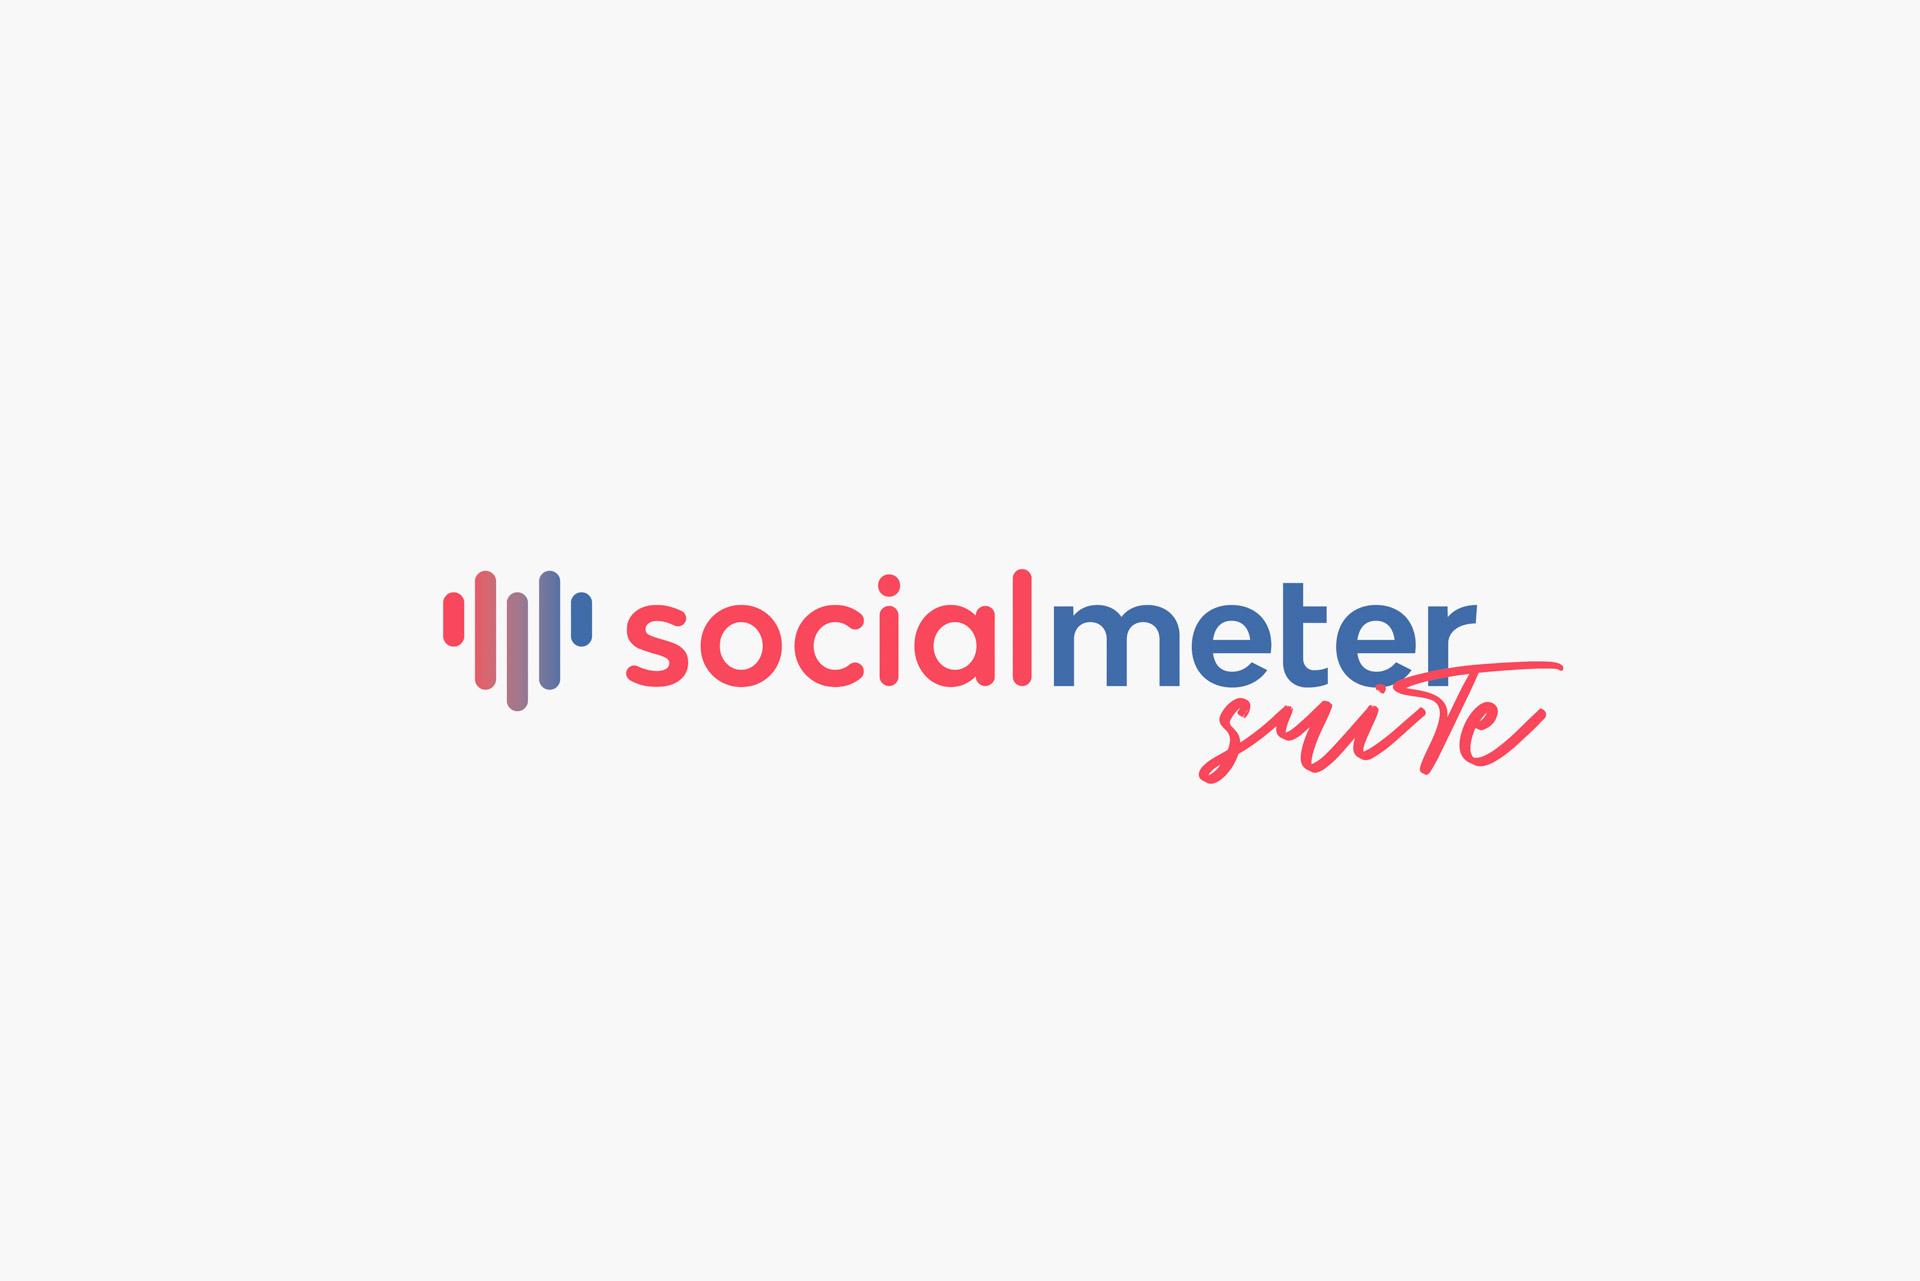 SocialMeter Suite logo